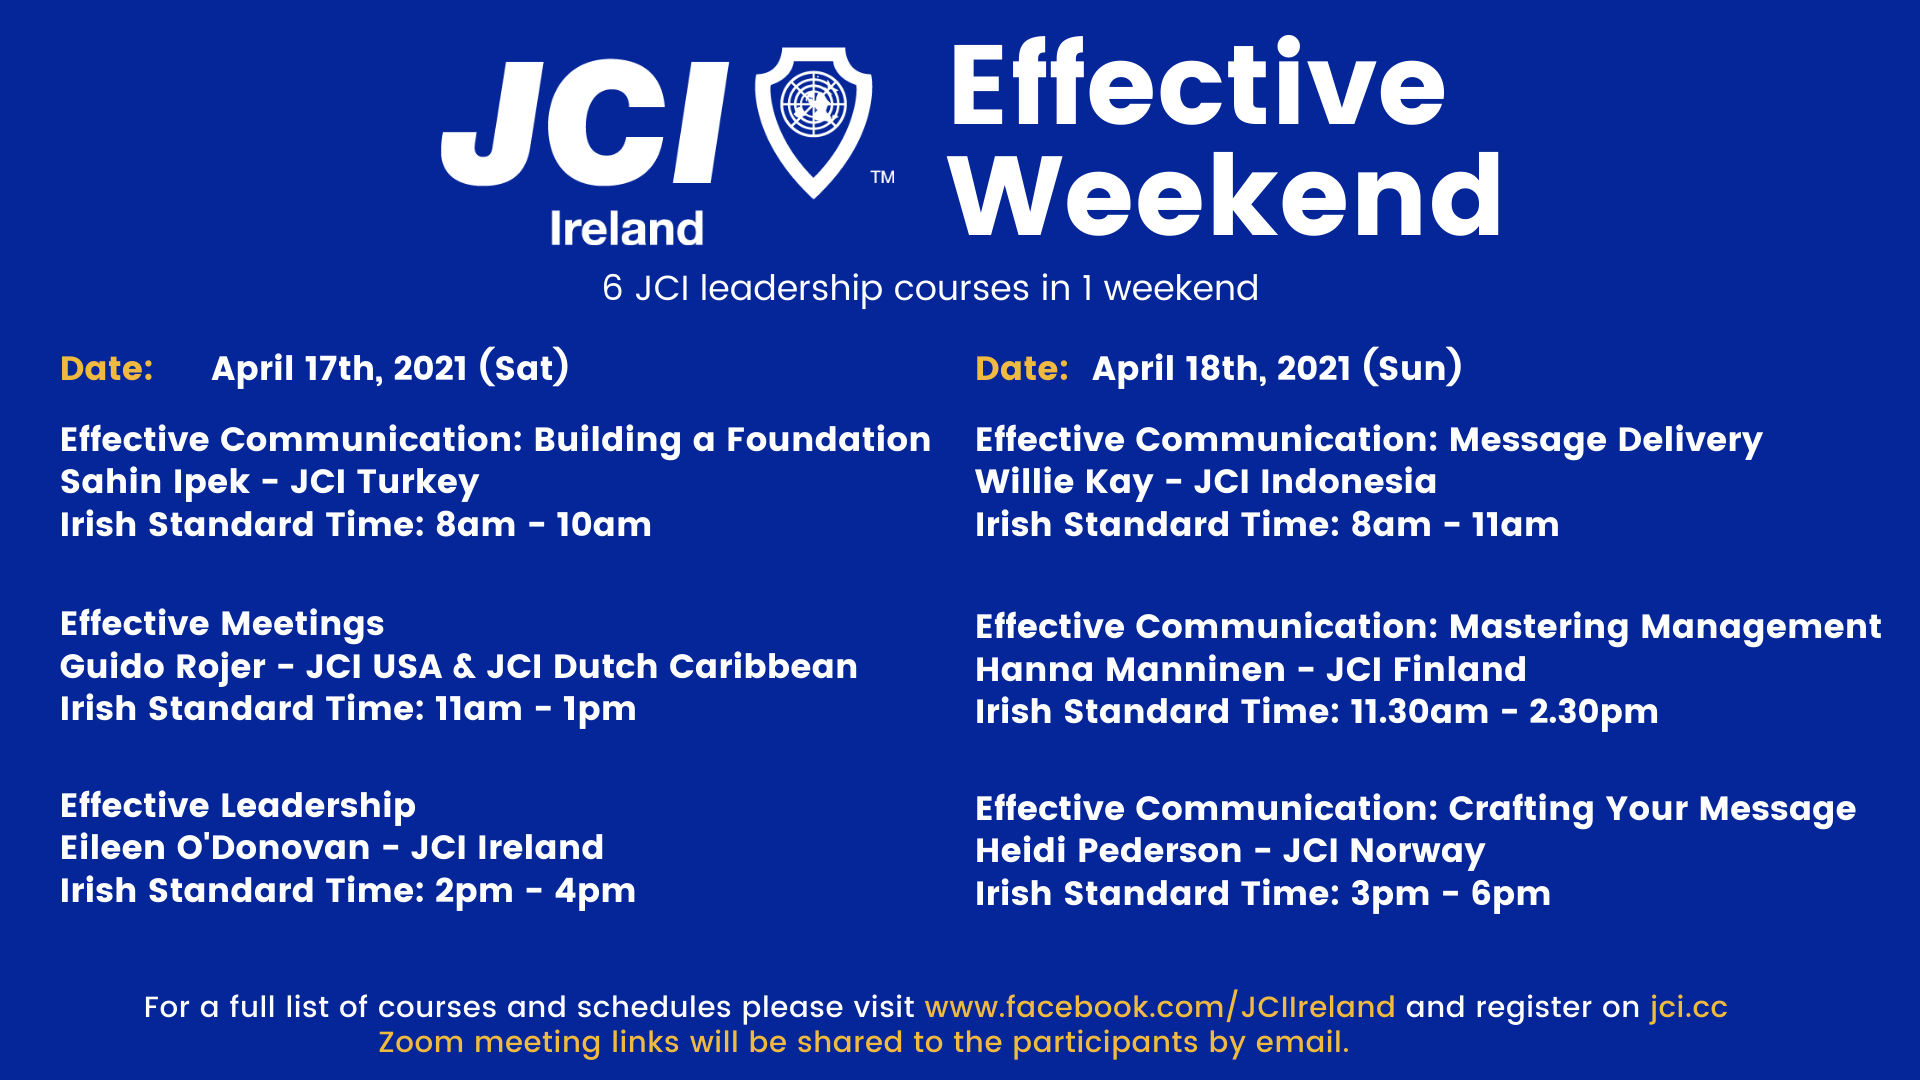 Effective Weekend 2021 - Effective Communication: Mastering Management